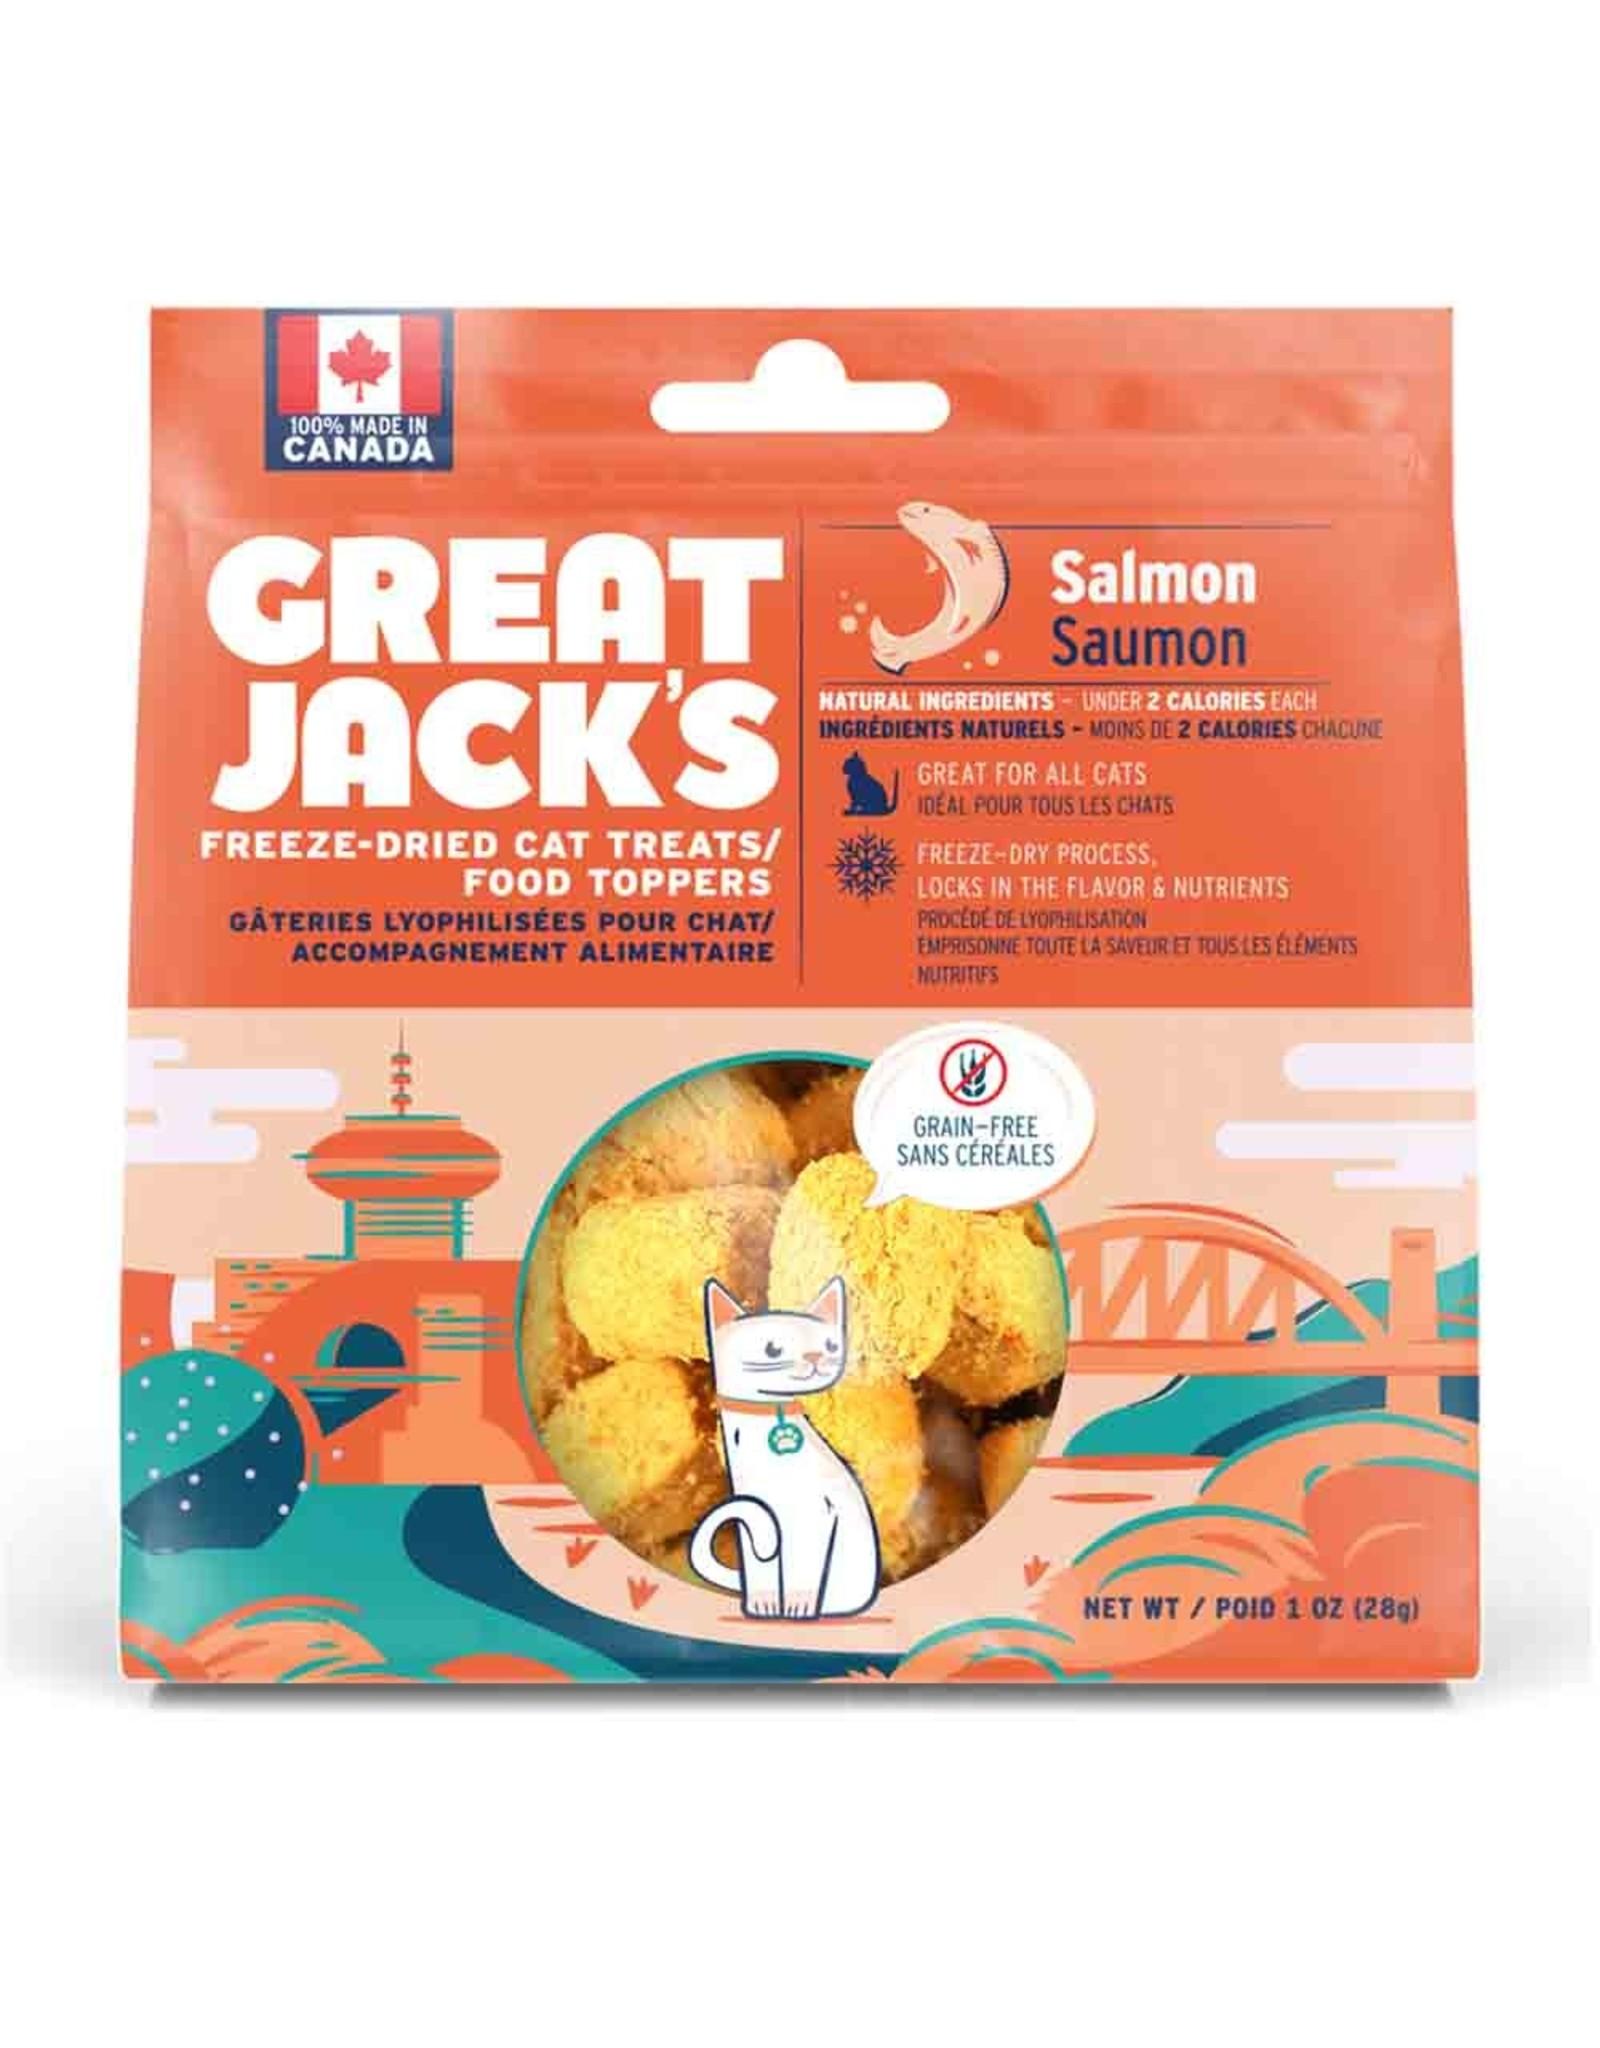 GREAT JACKS GREAT JACKS SALMON 85g